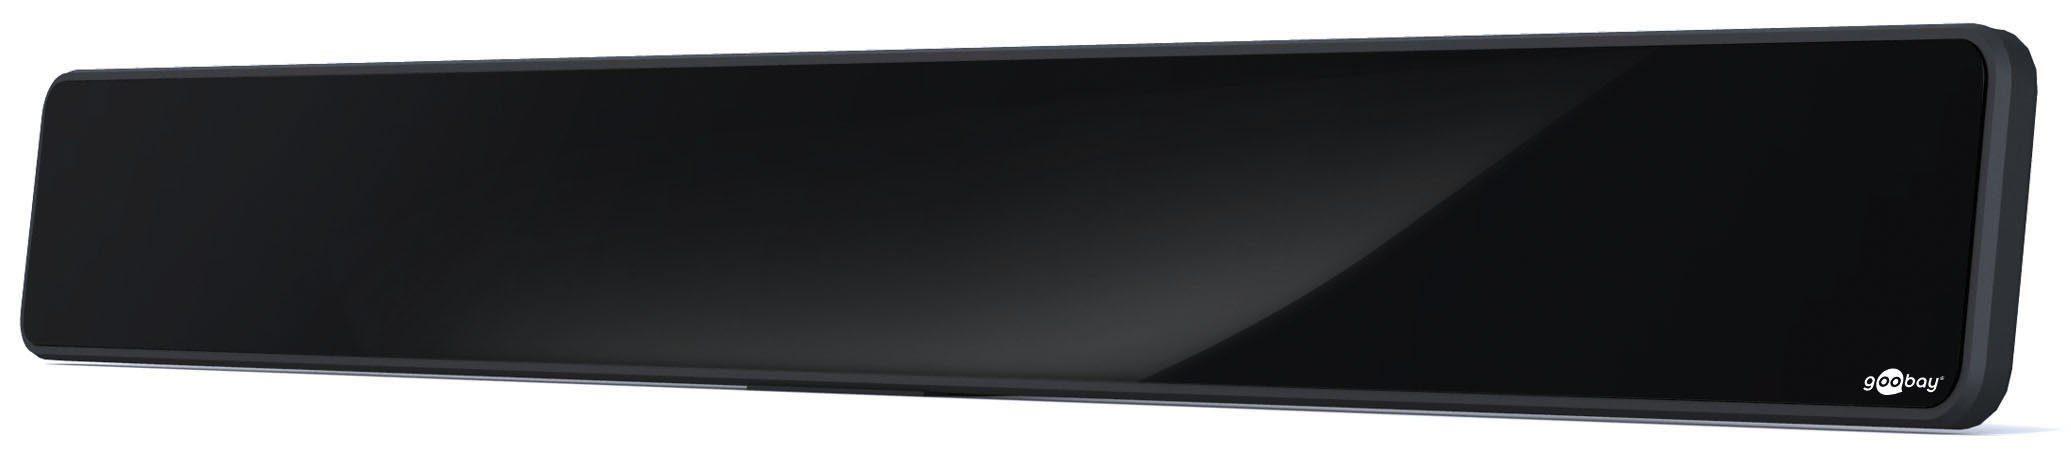 goobay Aktive Full HD DVB-T Zimmerantenne »zum Empfang von DVB-T/DVB-T2«